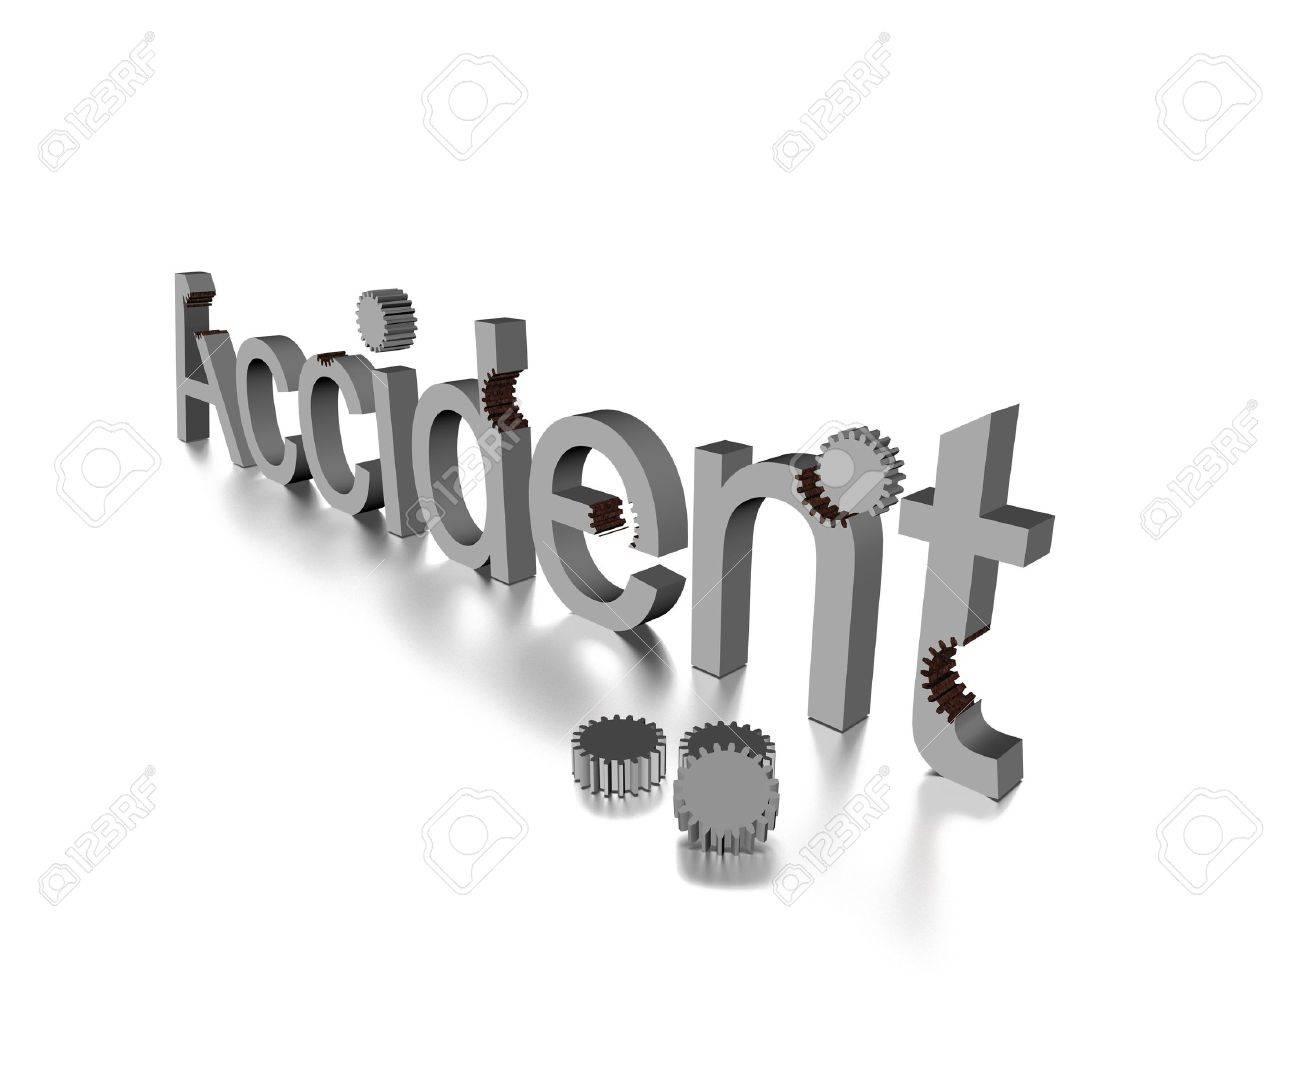 http://previews.123rf.com/images/media4dltd/media4dltd0906/media4dltd090600002/4955706-Text-describing-accident-Stock-Photo-accident-cartoon-man.jpg